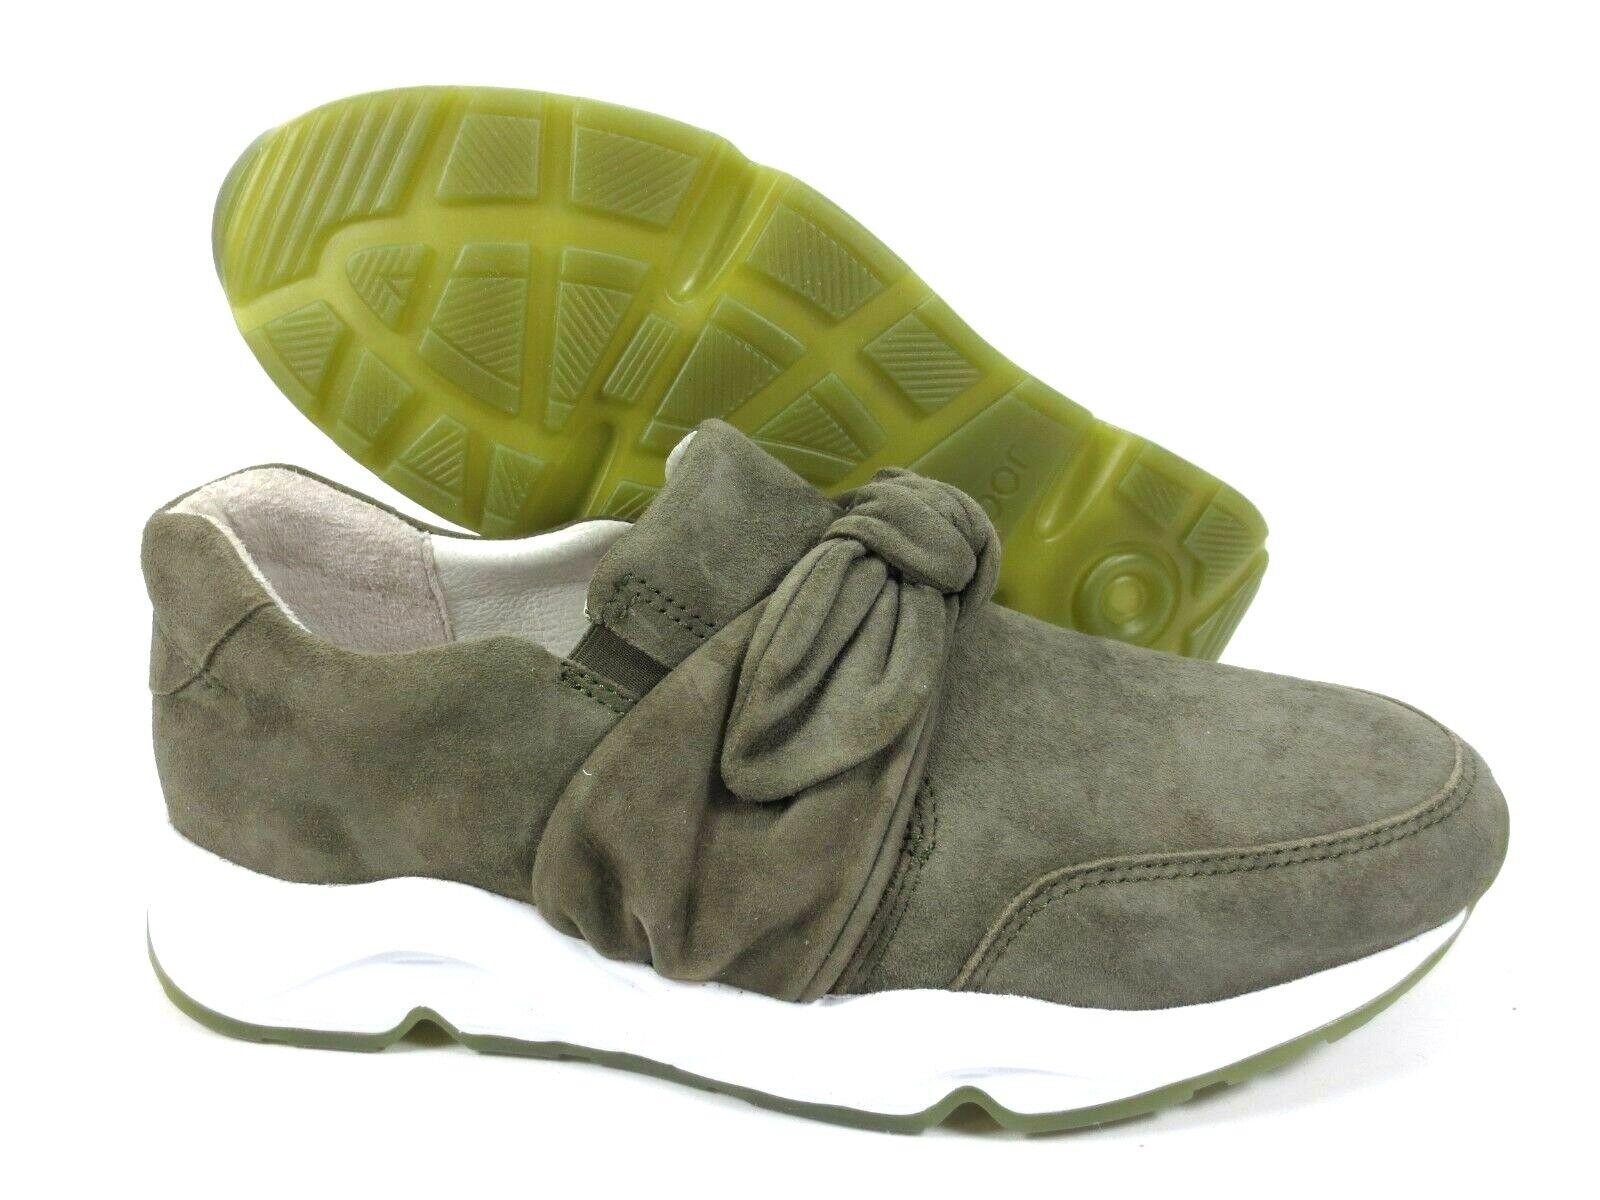 Gabor Comfort scarpe da ginnastica Slipper Scarpe in Pelle verde Oliva Larghezza G NUOVO UVP 134,95